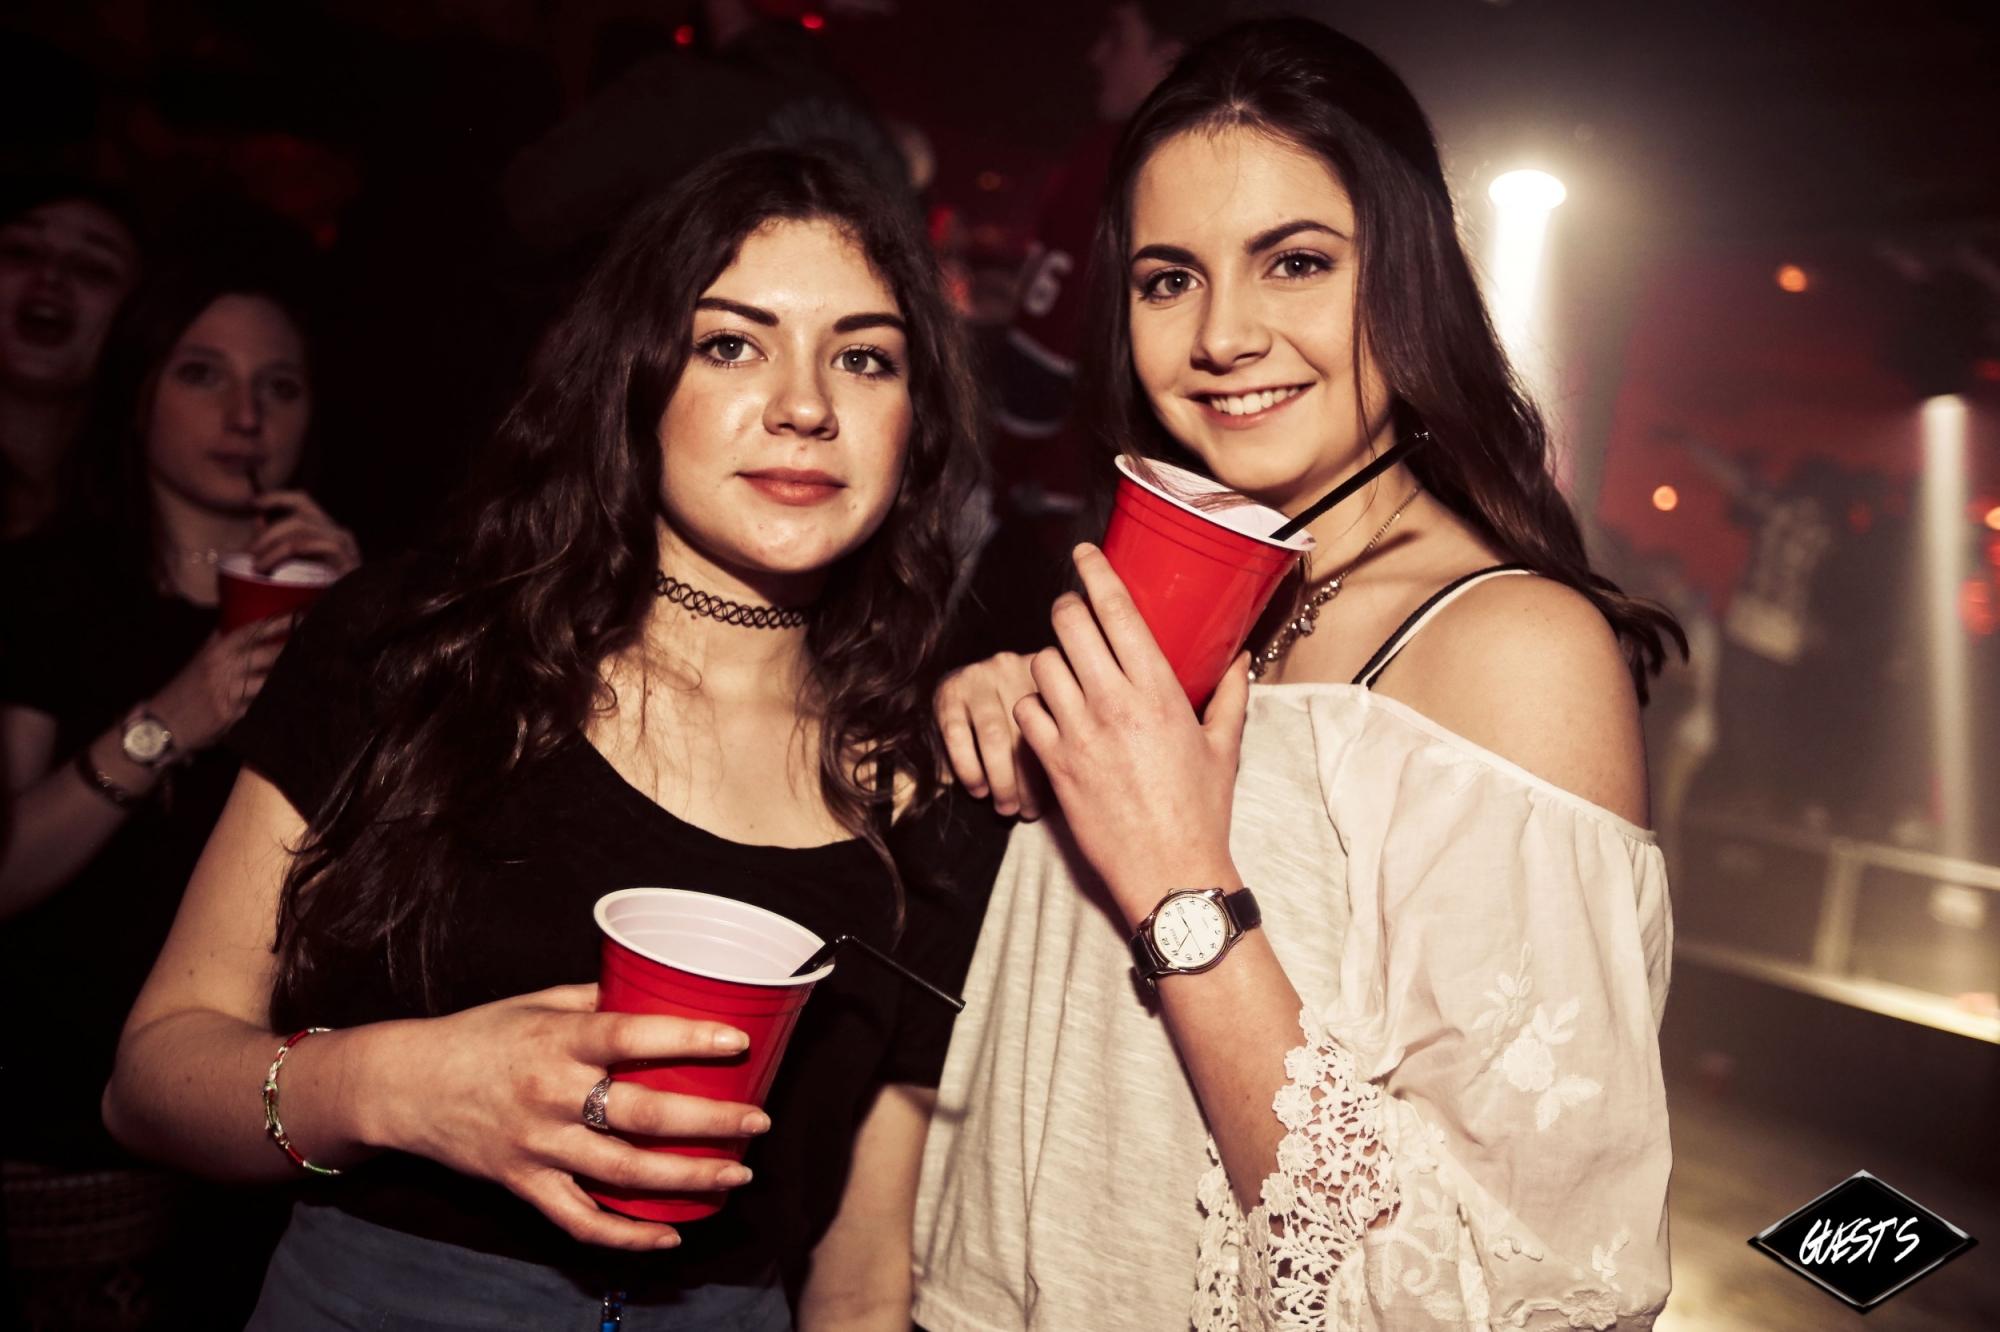 La Sauce Drake Edition - Vendredi 31 Mars 2017 - 14